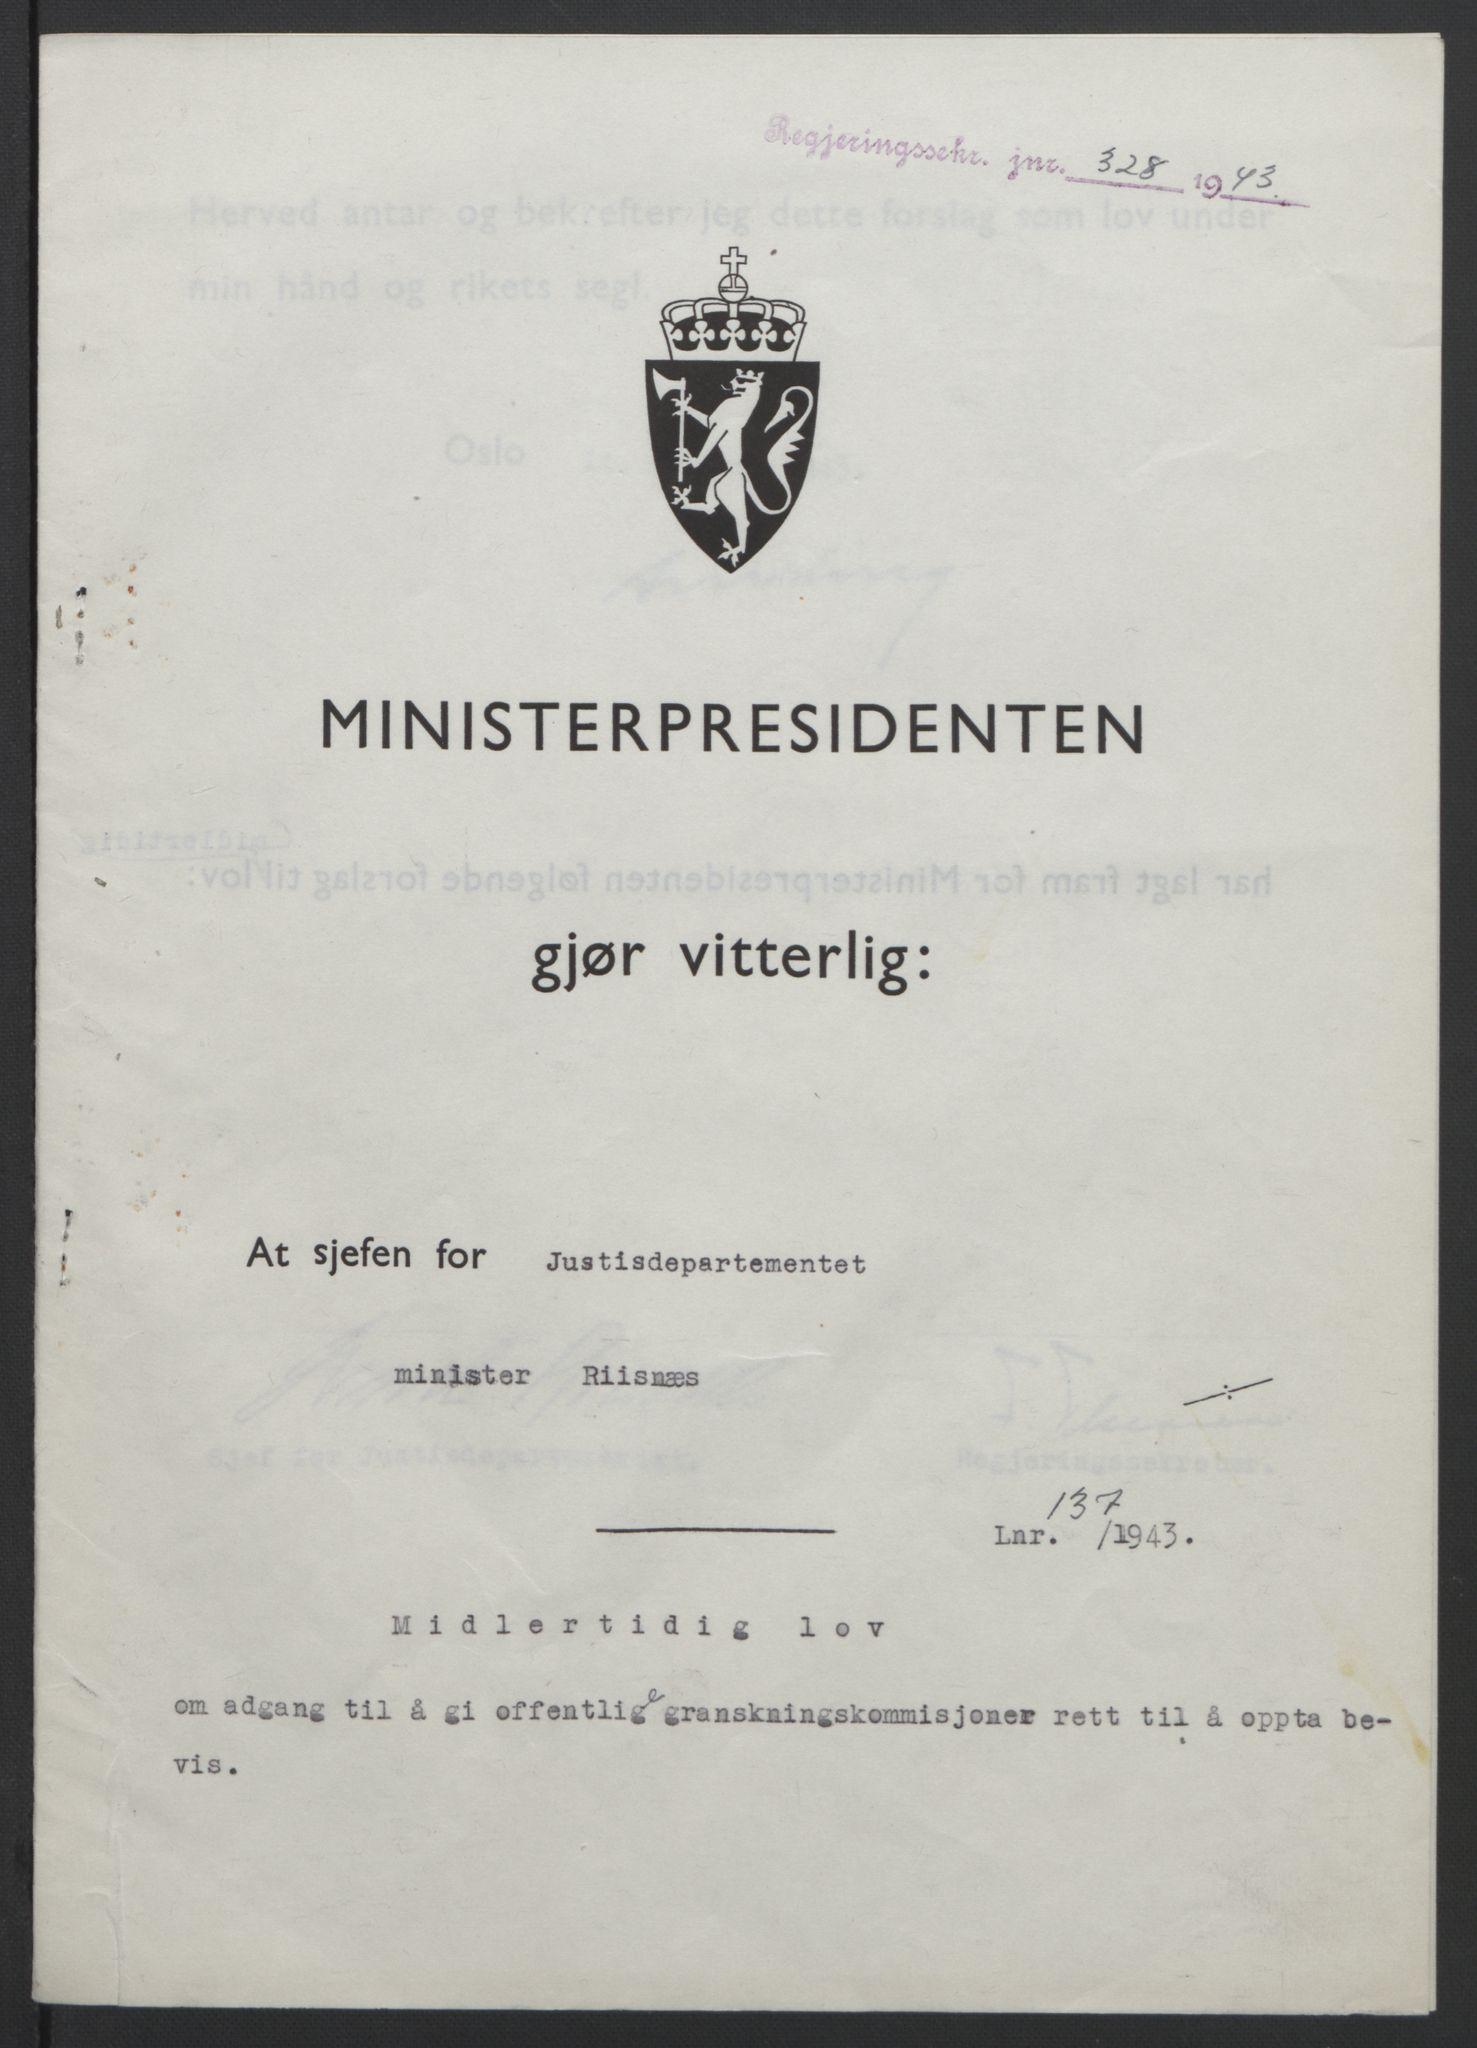 RA, NS-administrasjonen 1940-1945 (Statsrådsekretariatet, de kommisariske statsråder mm), D/Db/L0099: Lover, 1943, s. 638